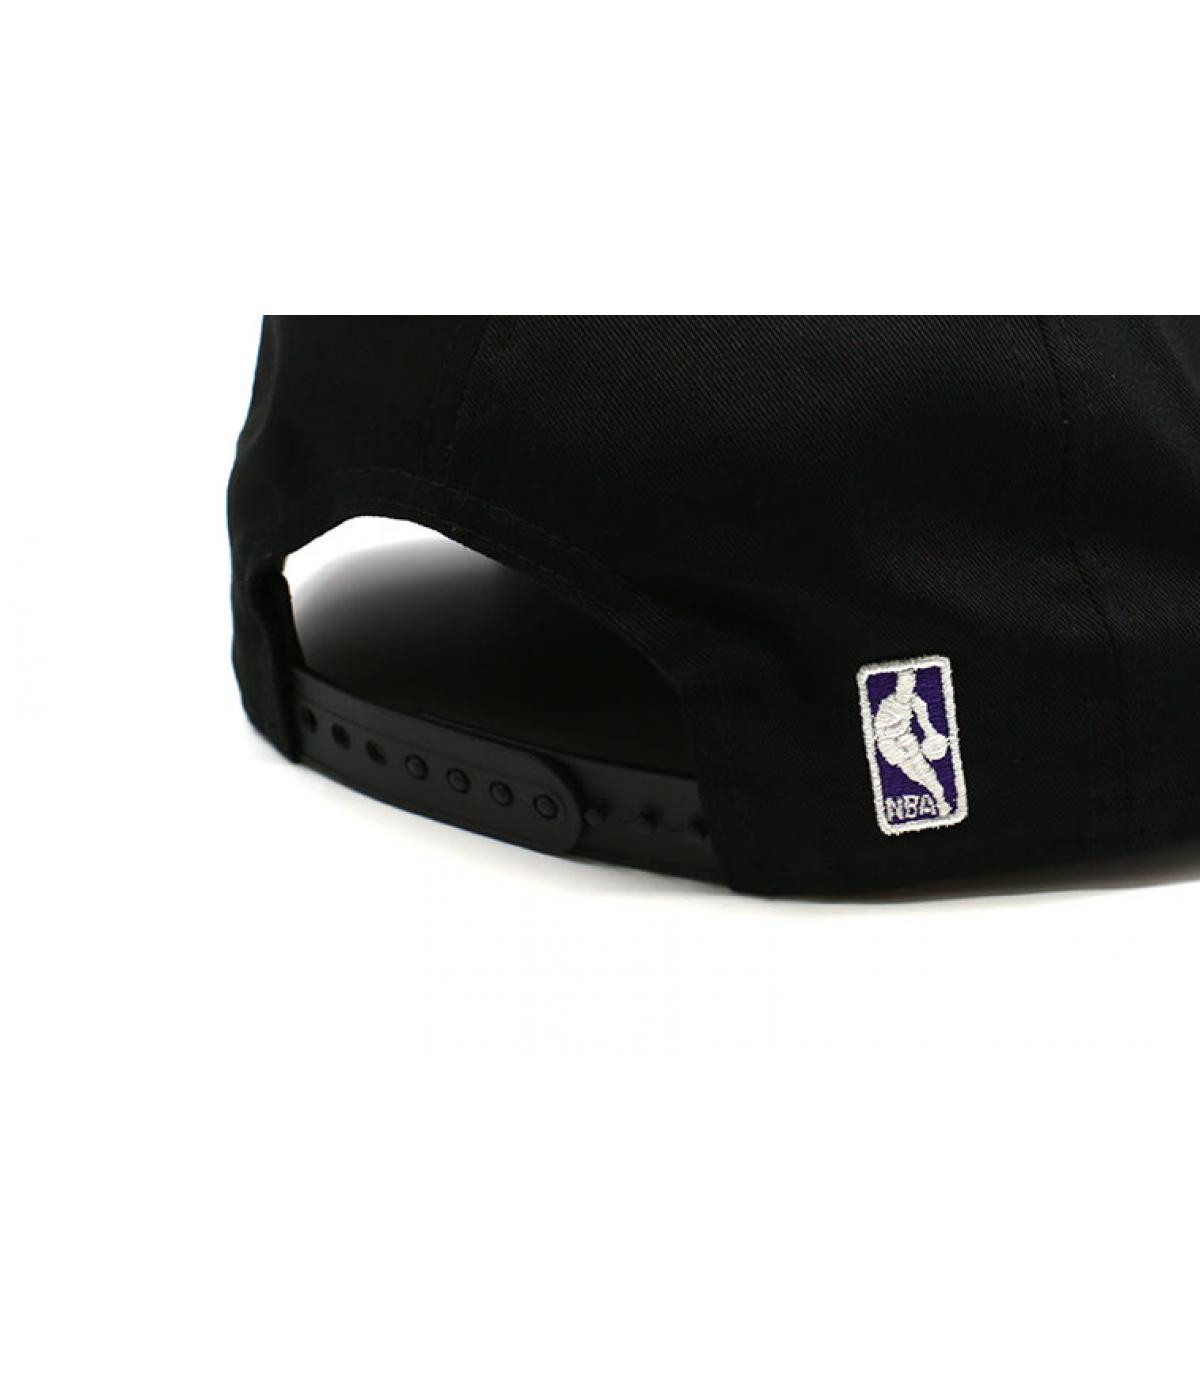 Détails NBA Lakers 9Fifty - image 5